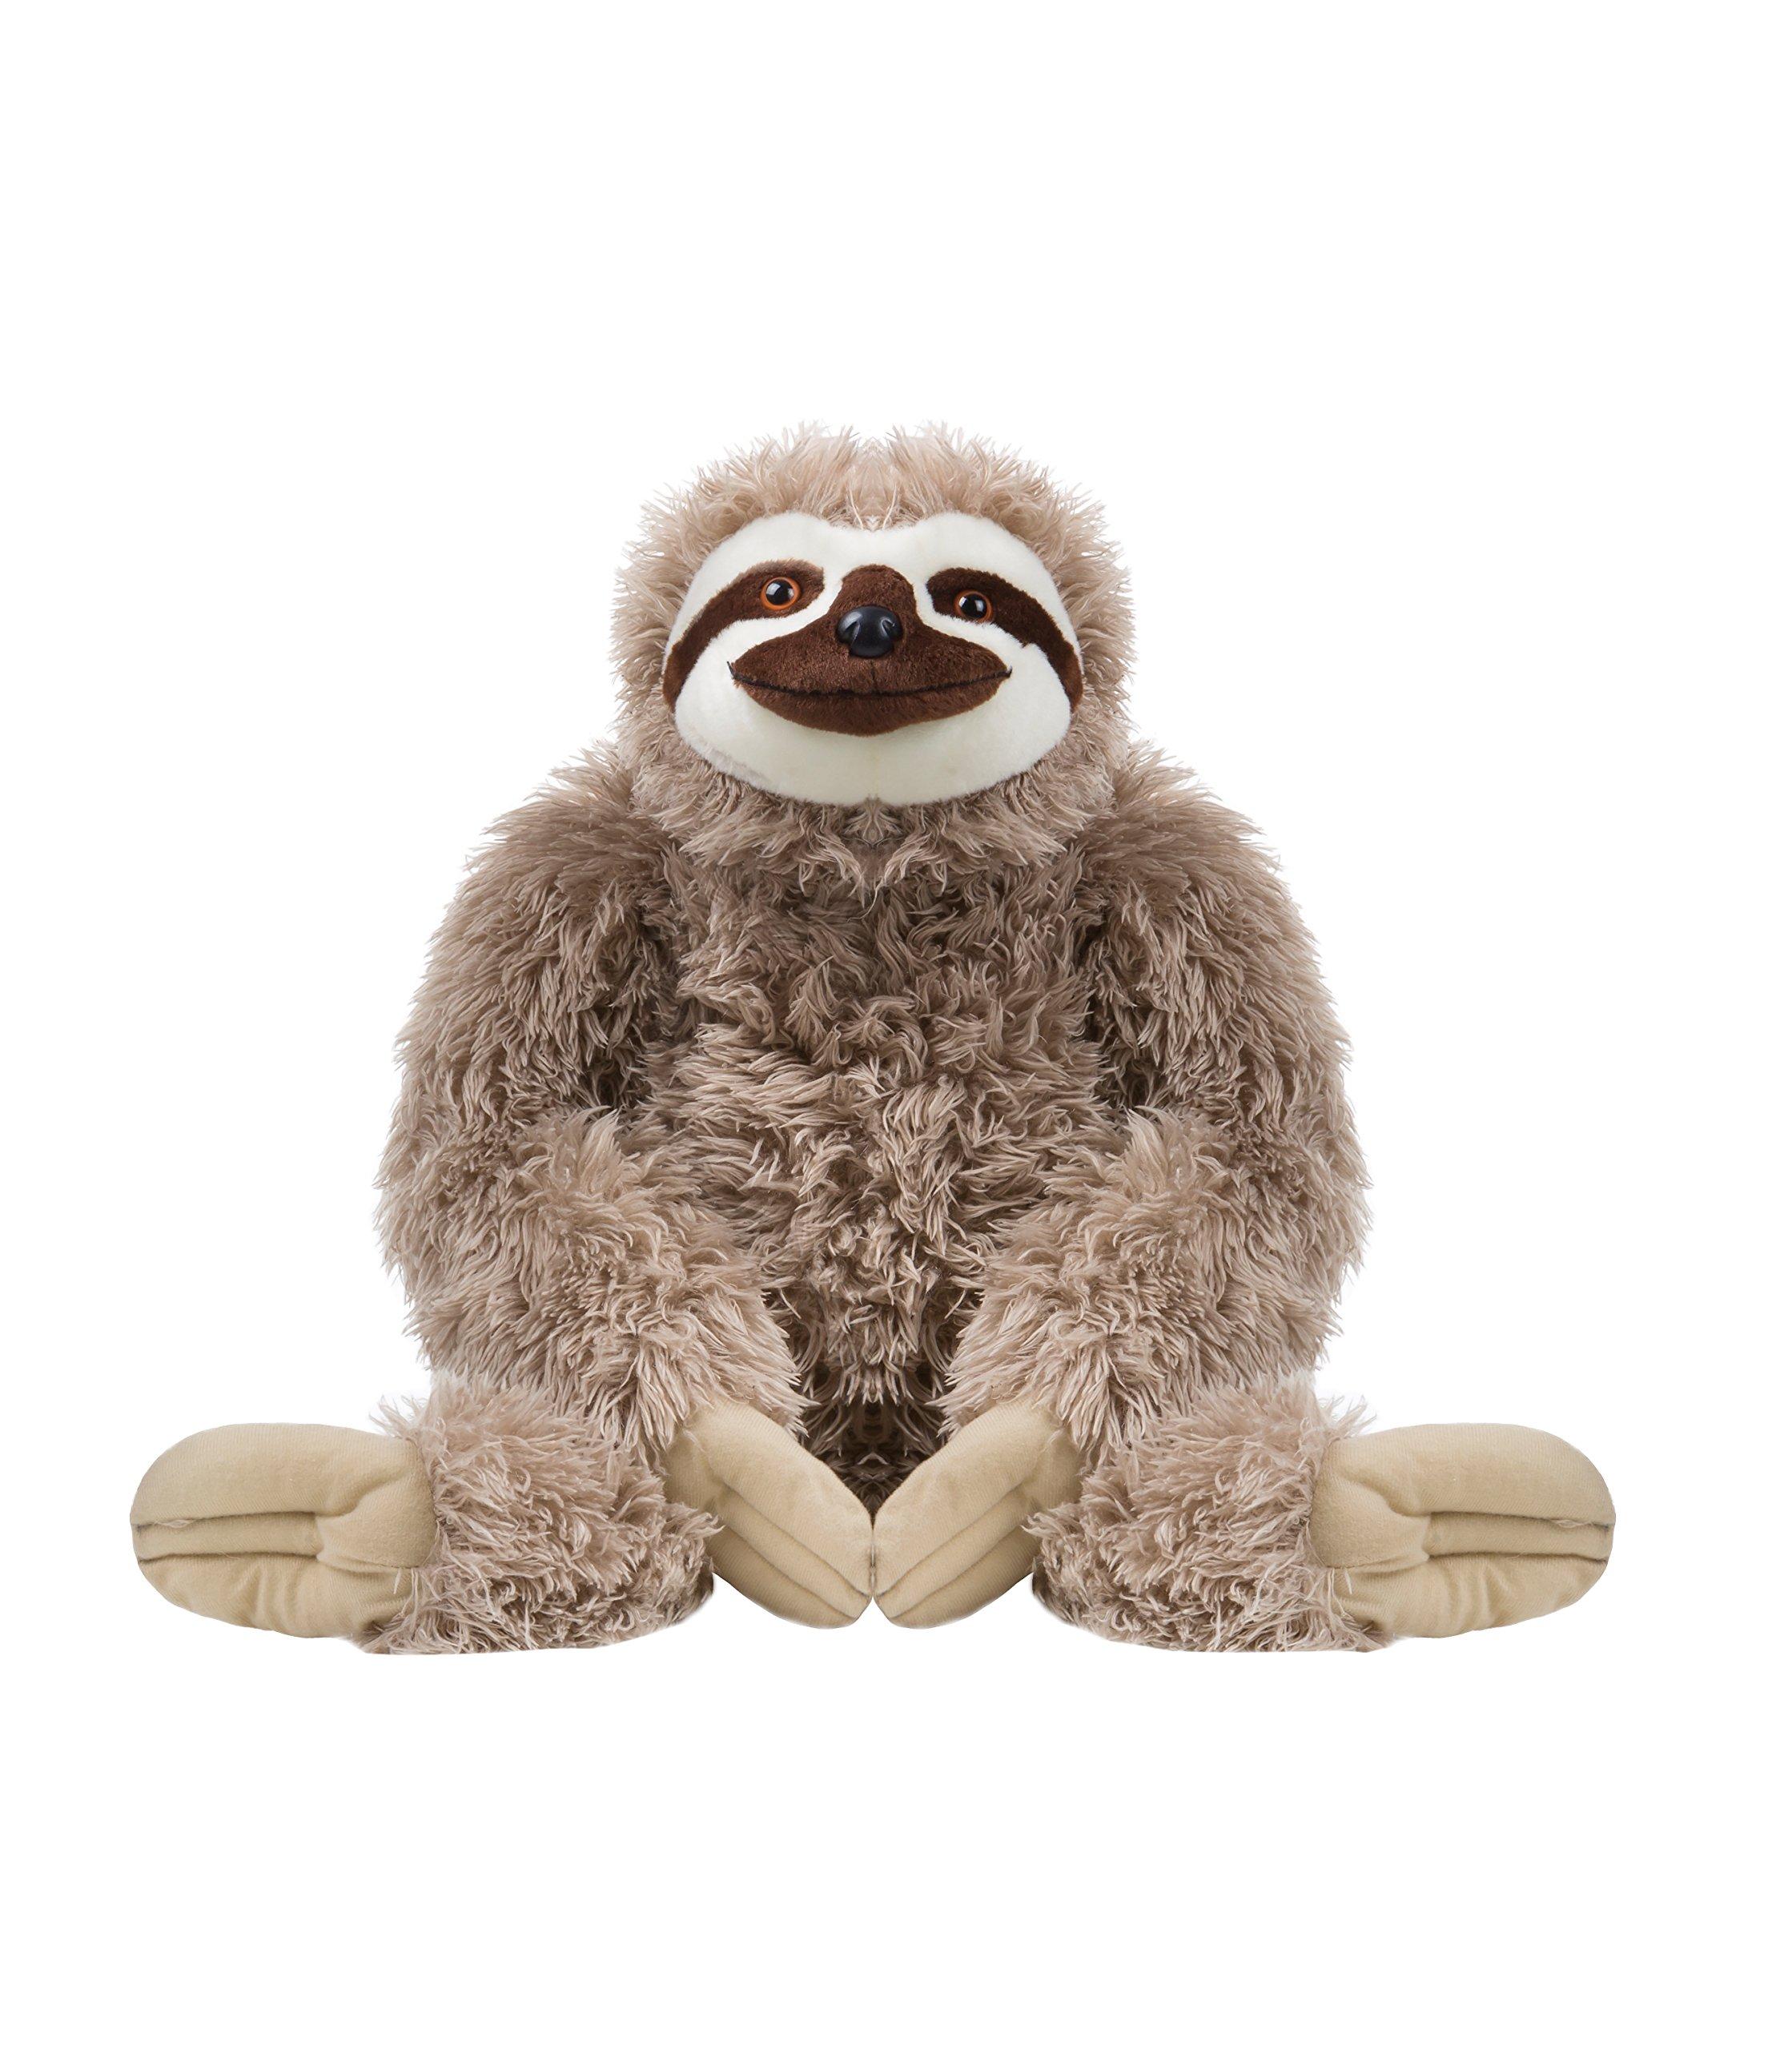 Wild Republic Jumbo Sloth Plush, Giant Stuffed Animal, 30 Inches by Wild Republic